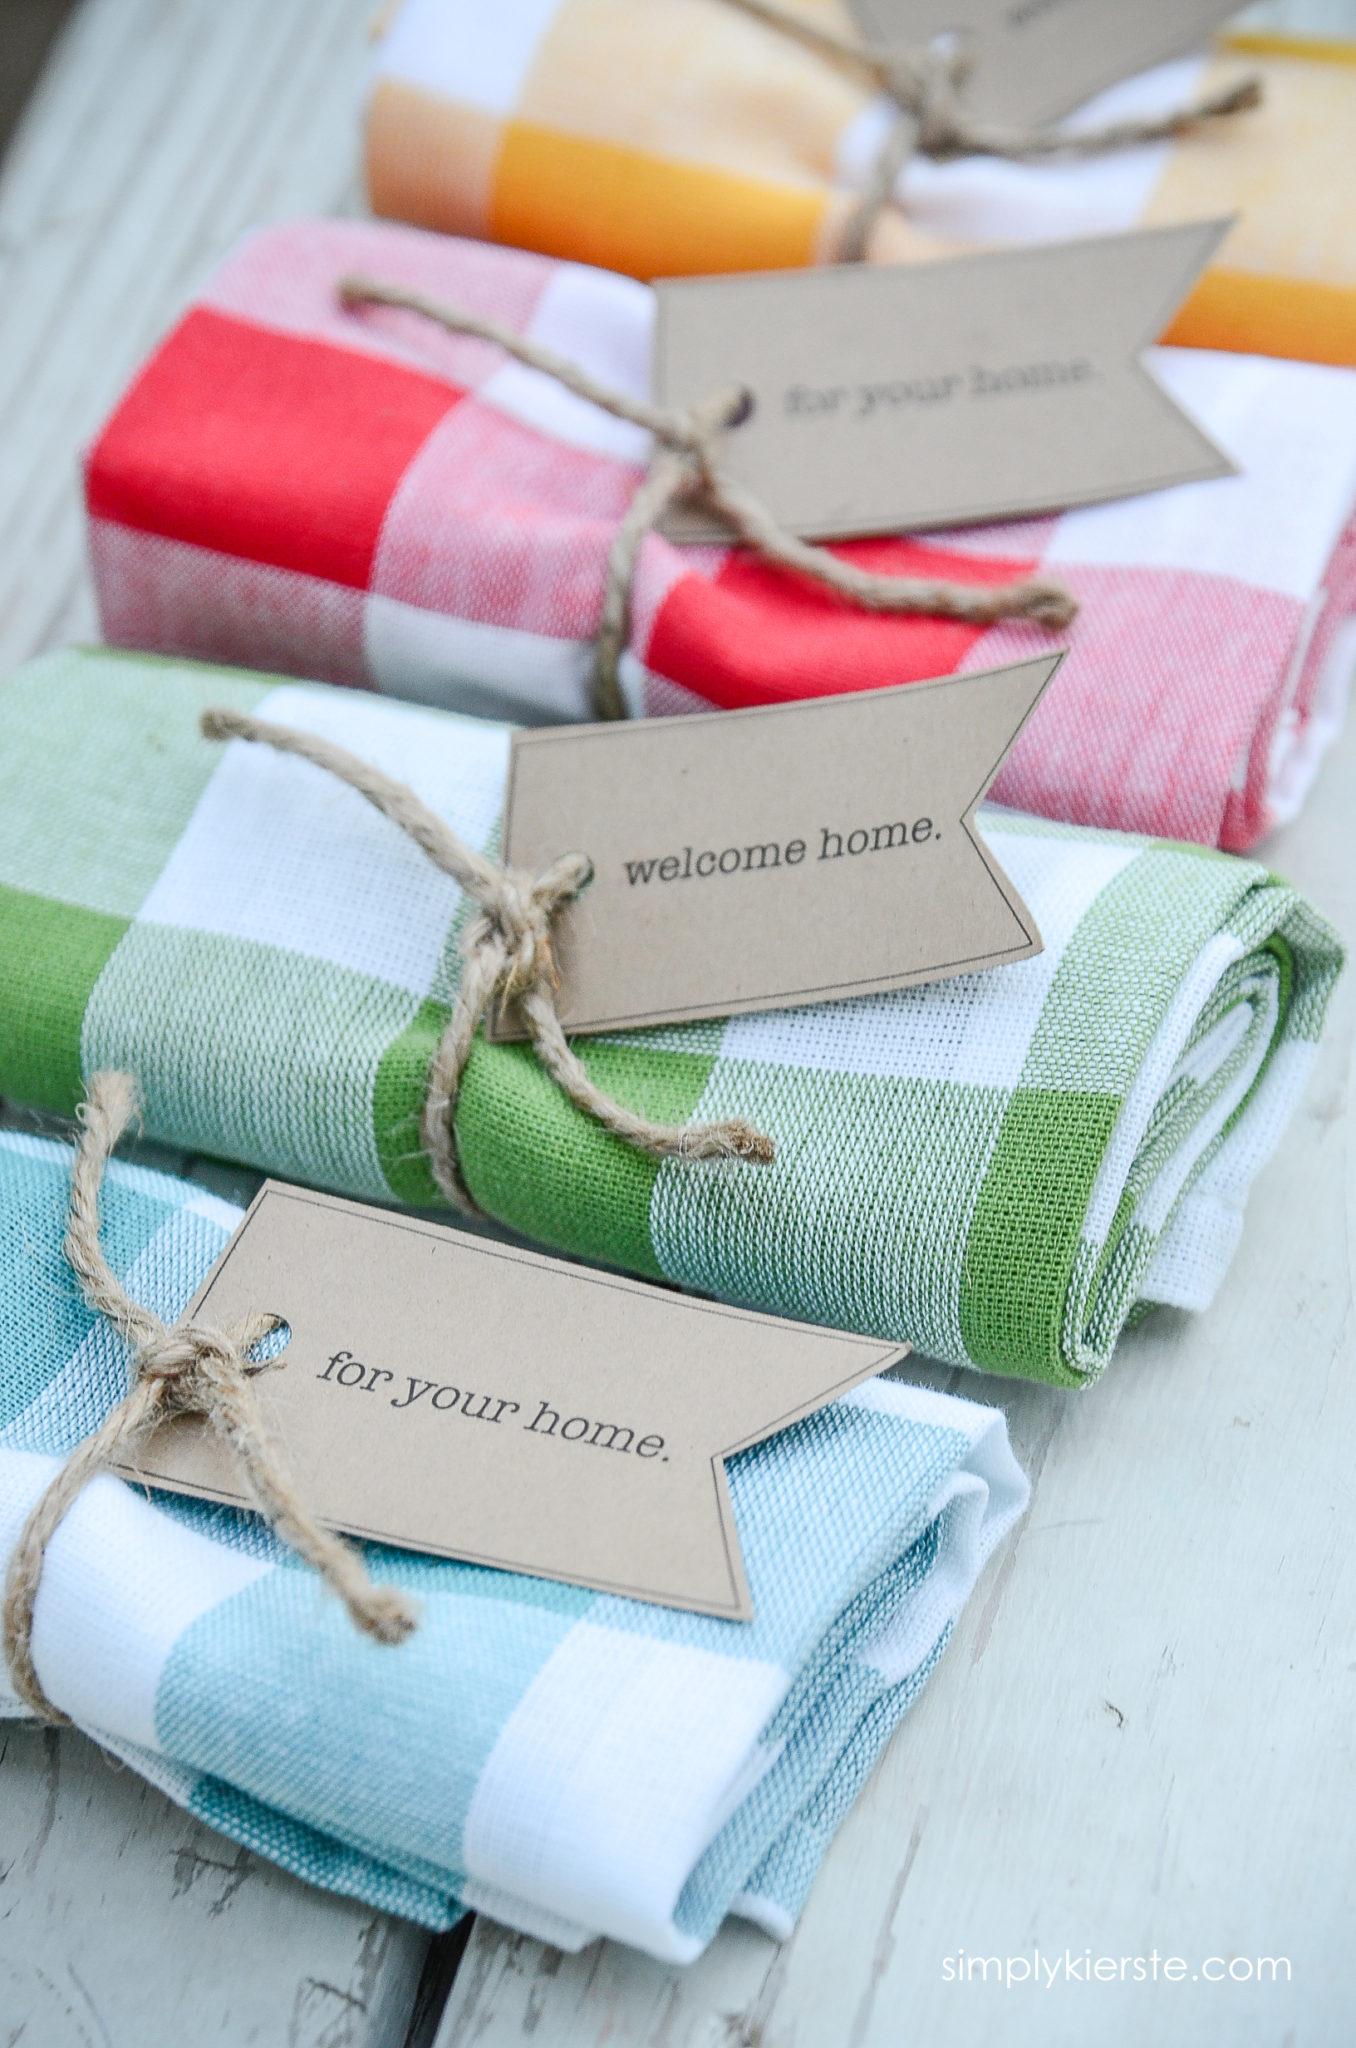 Easy & Adorable Dishtowel Gift Idea - Simply Kierste Design Co.